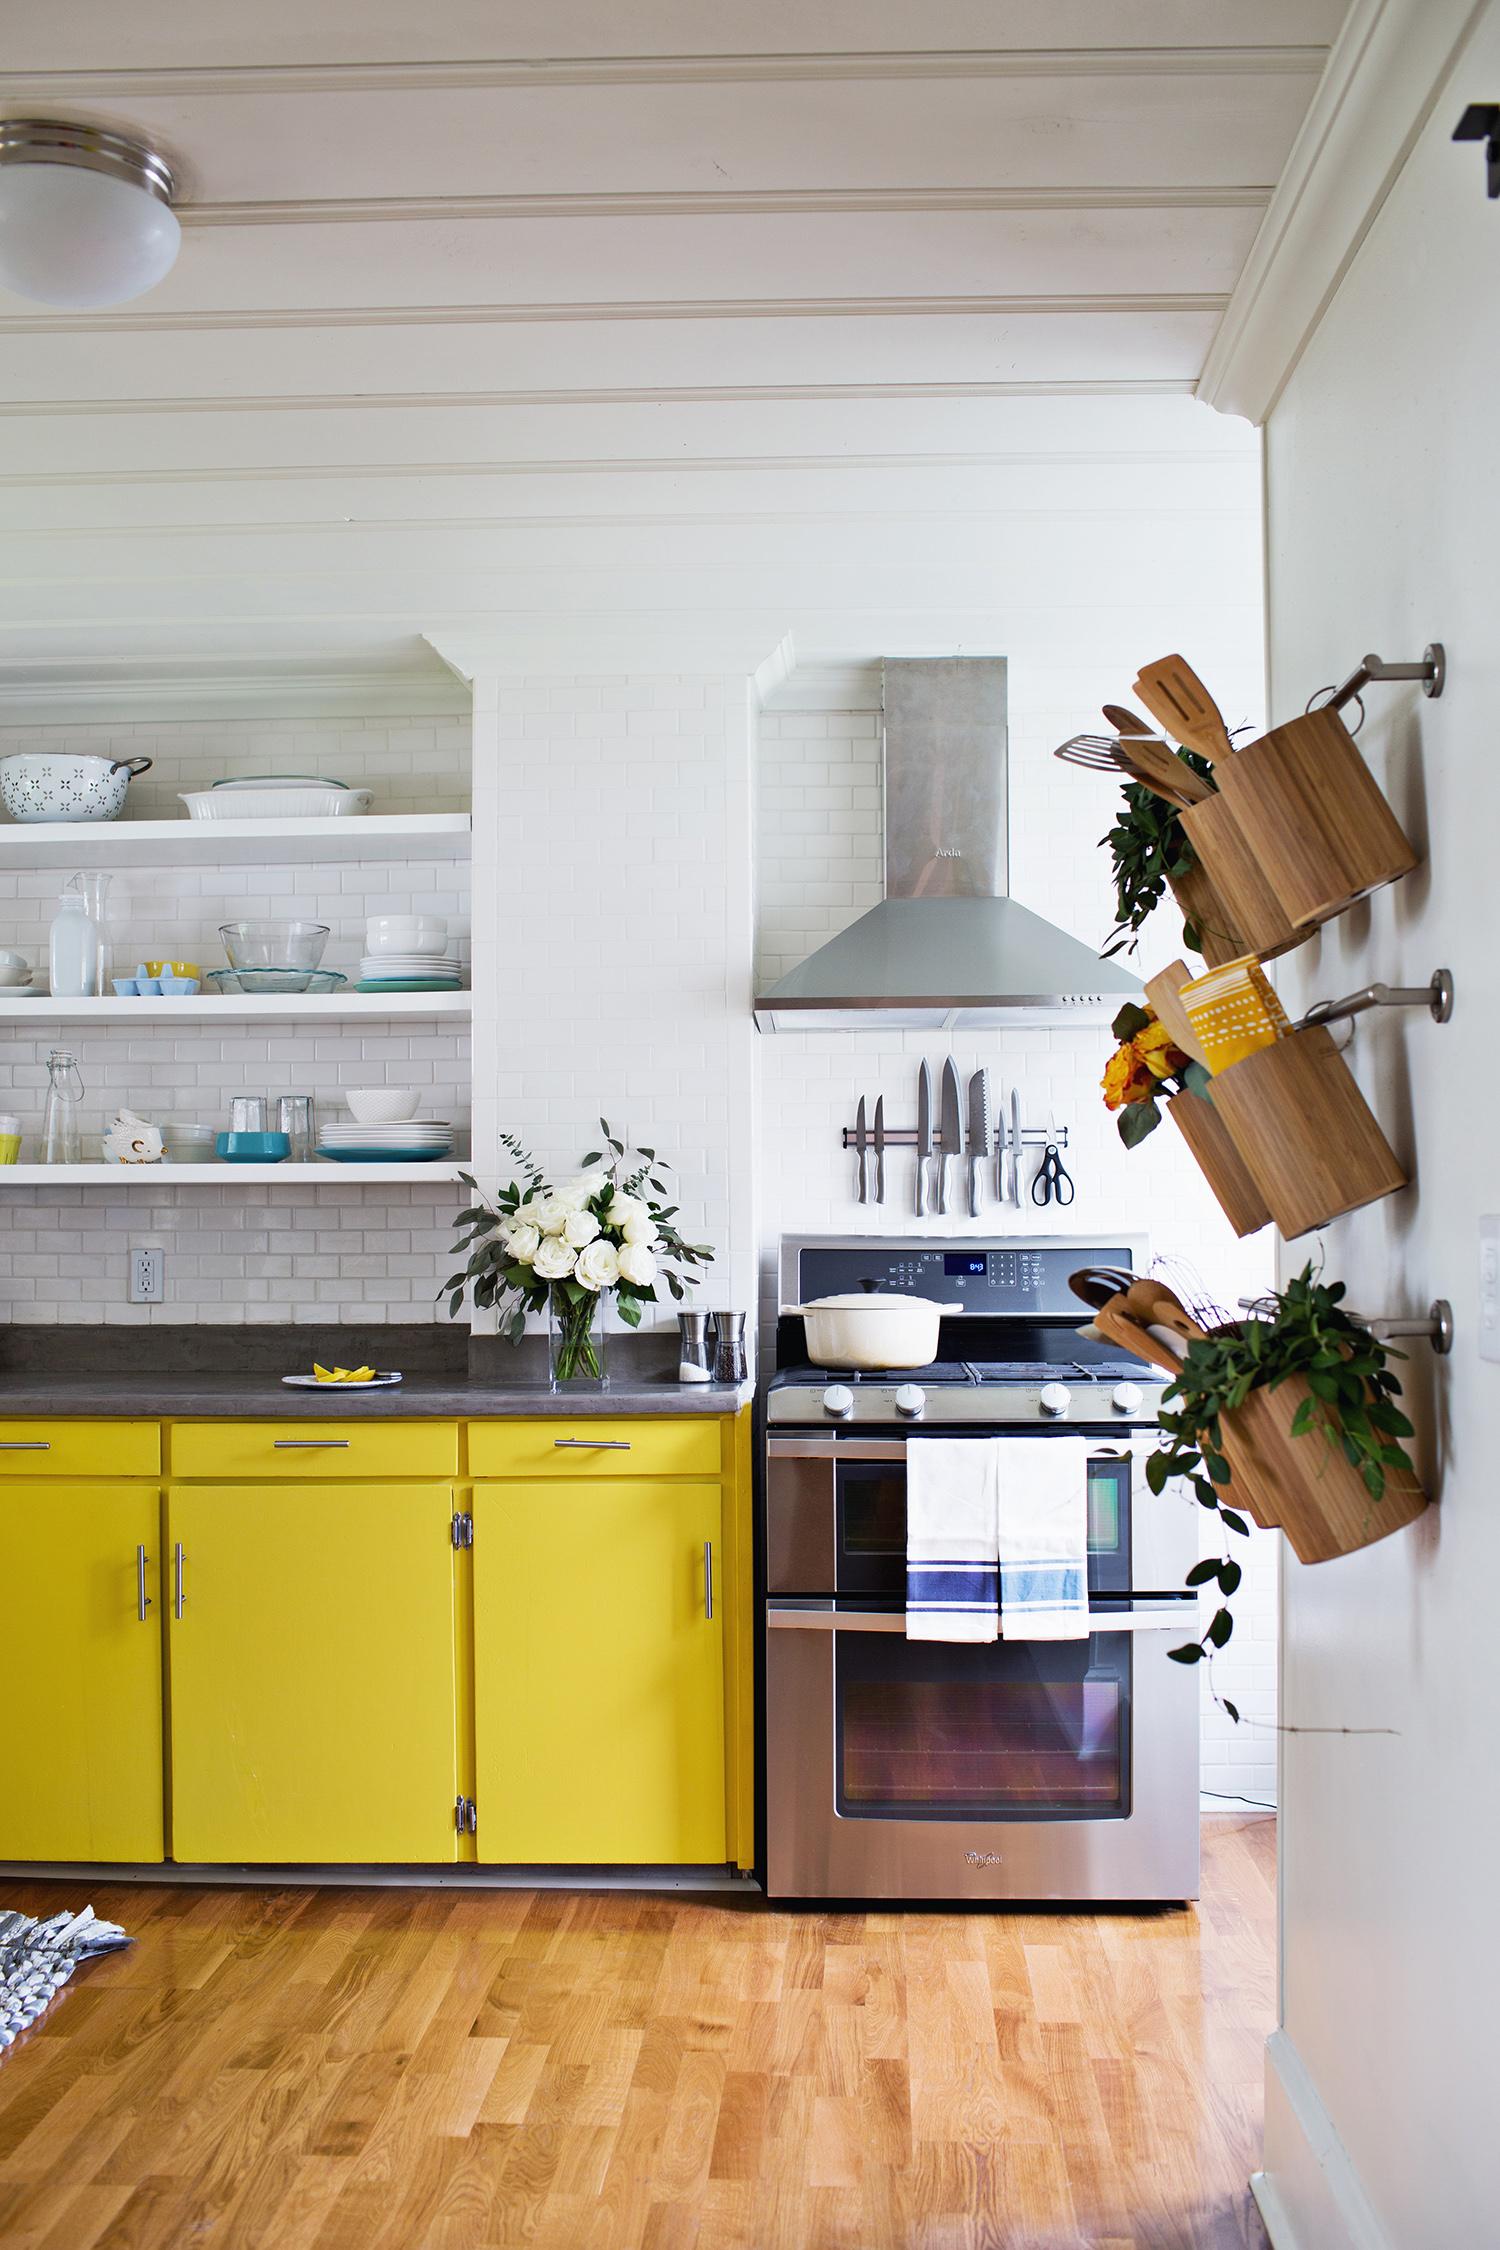 Kitchen Tour (via A Beautiful Mess)